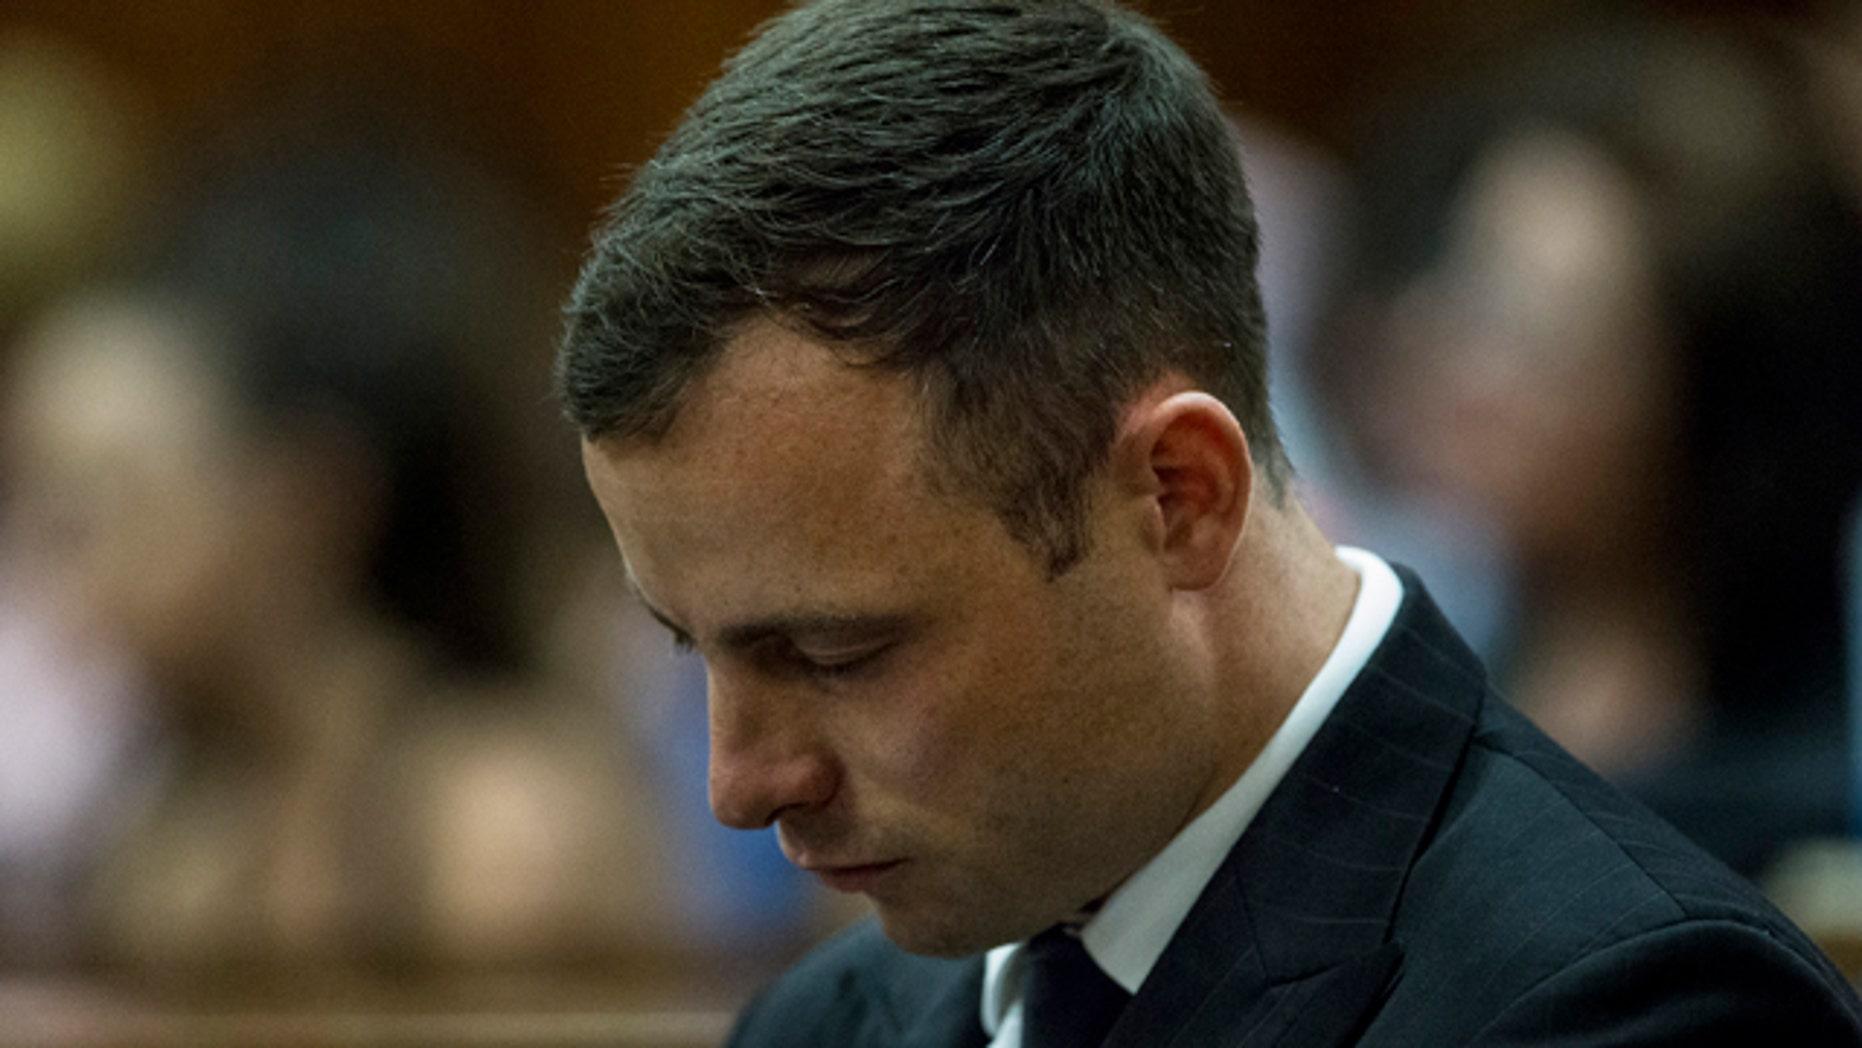 October 13, 2014: Oscar Pistorius arrives in court to face sentencing for the shooting death of his girlfriend Reeva Steenkamp. (AP Photo/Marco Longari. Pool)